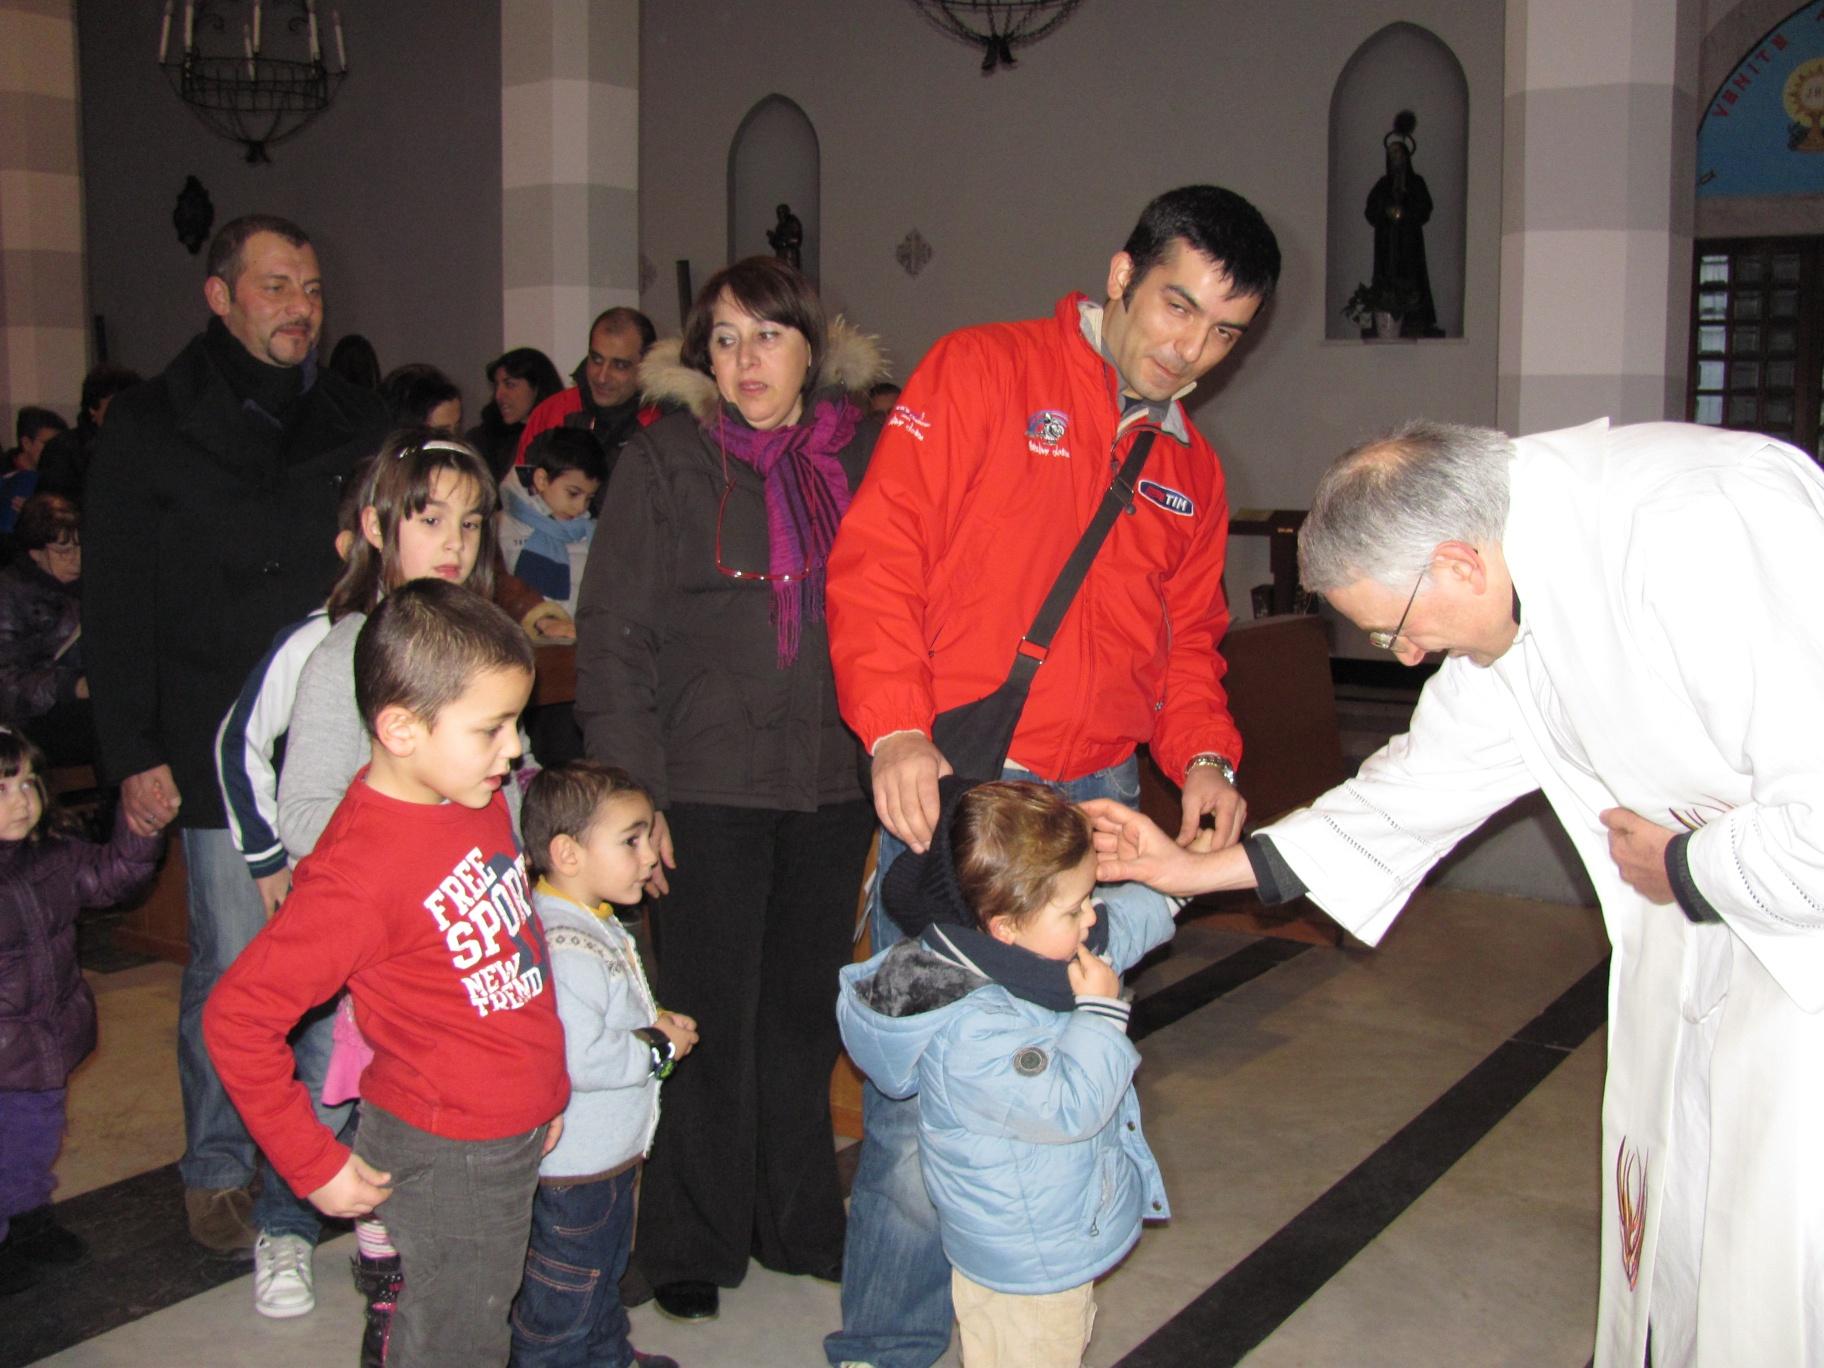 ricordo_battesimo_gesu_2011-01-23-16-29-38